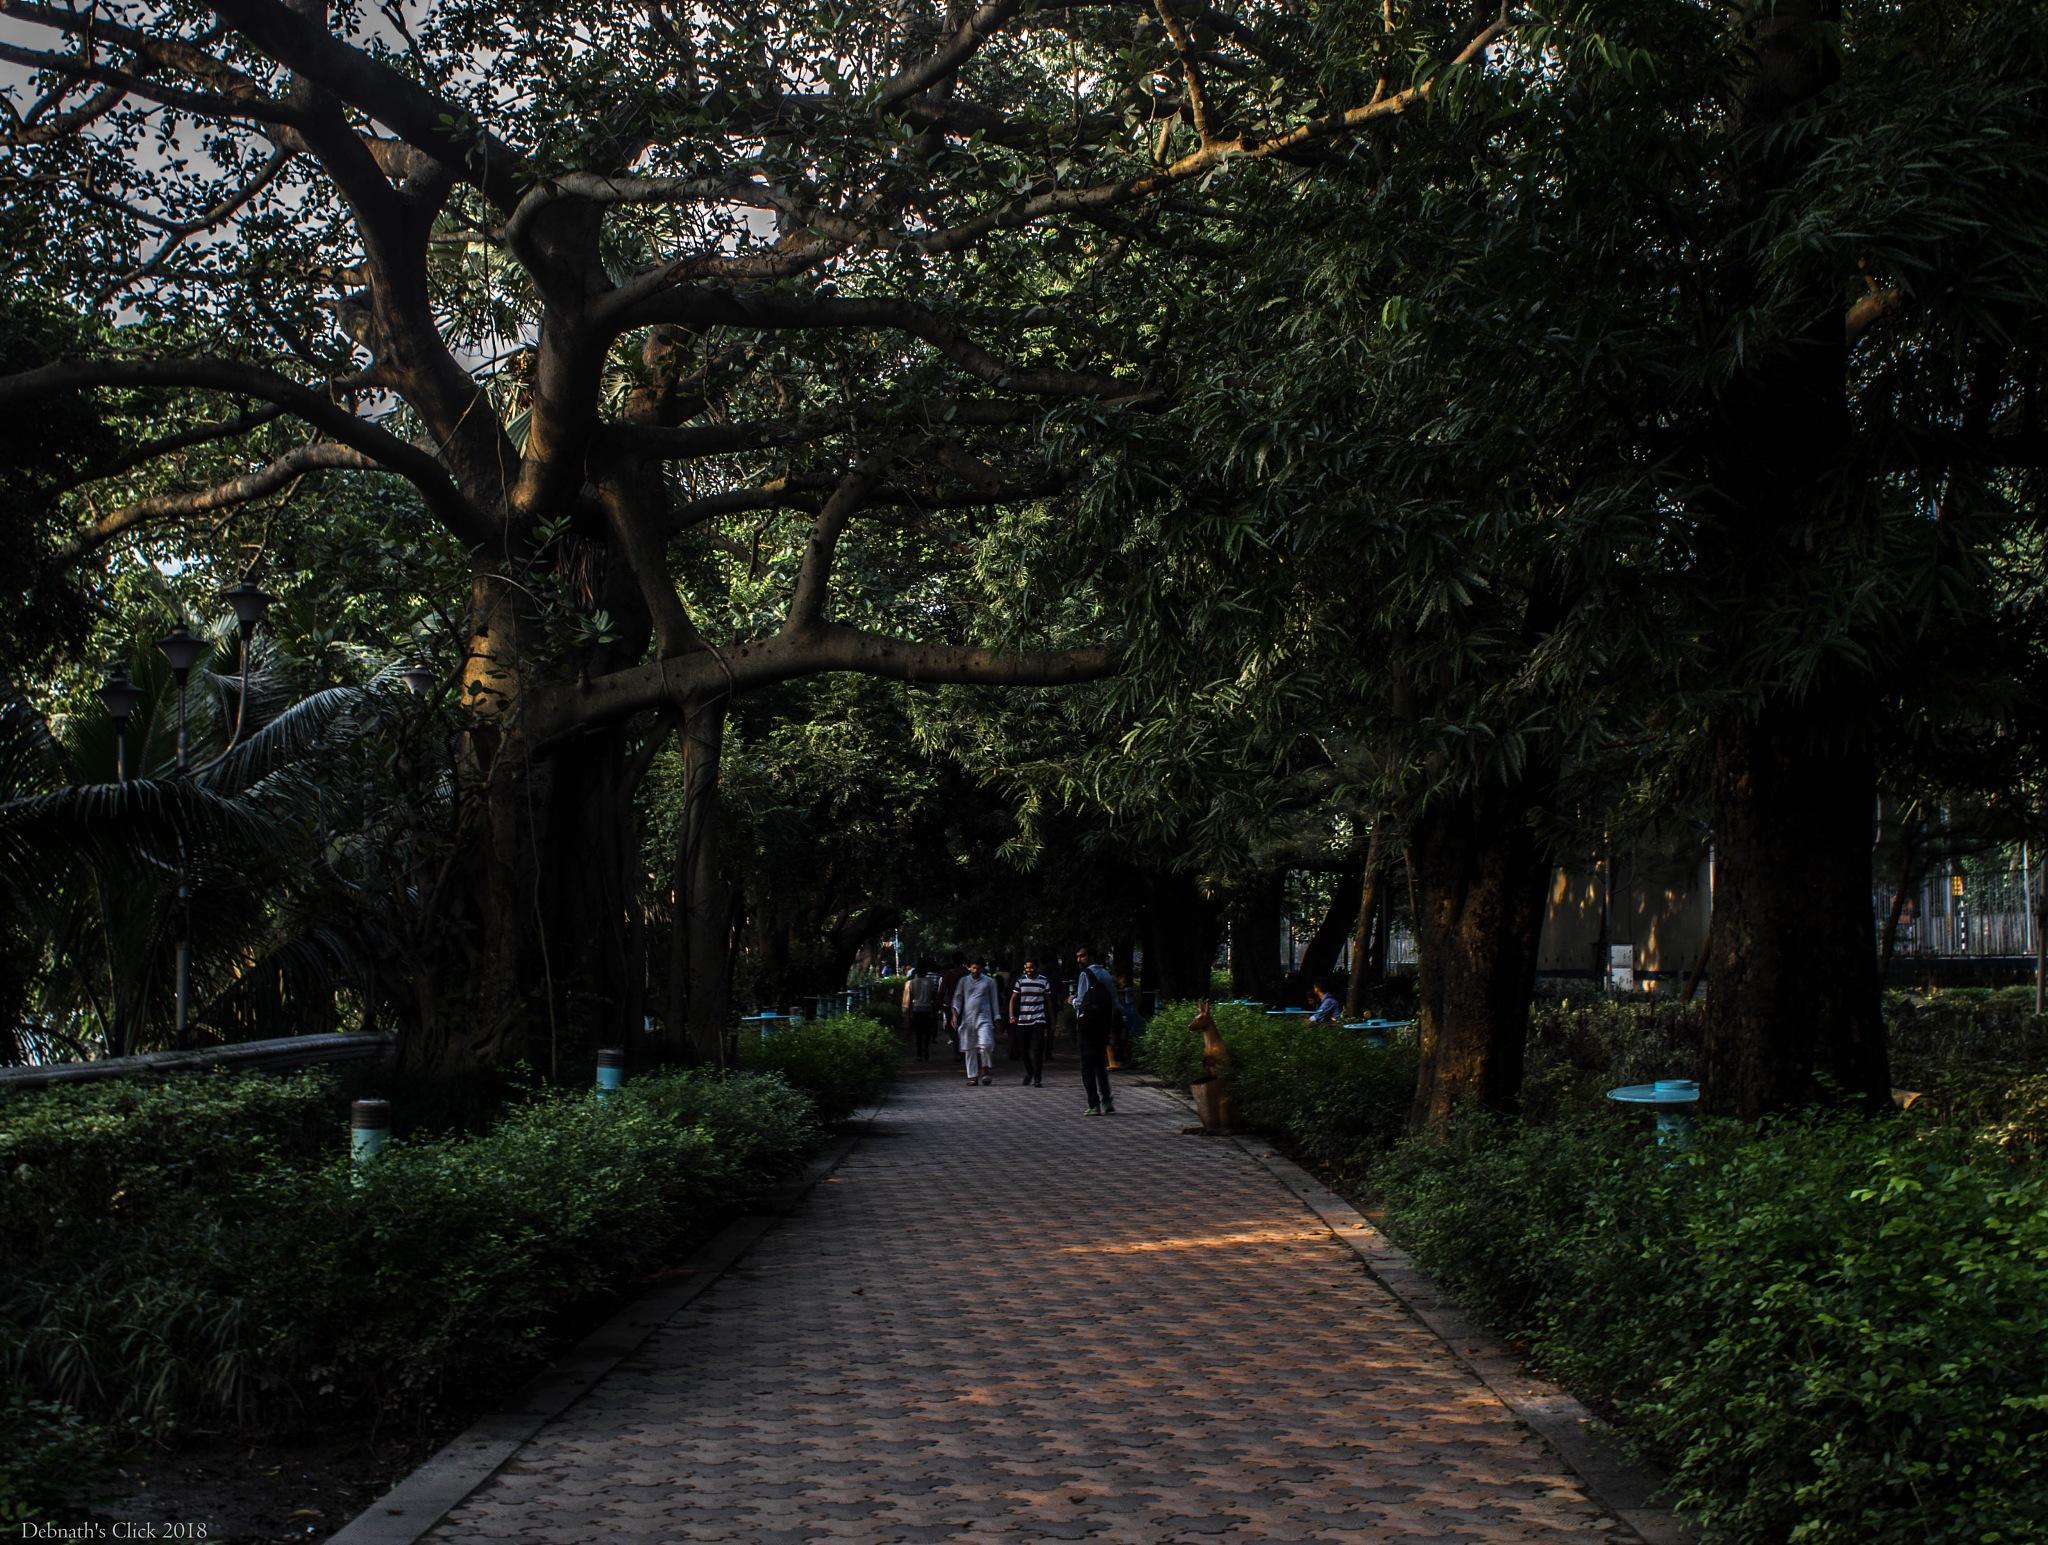 Princep Ghat by Suvojit Debnath